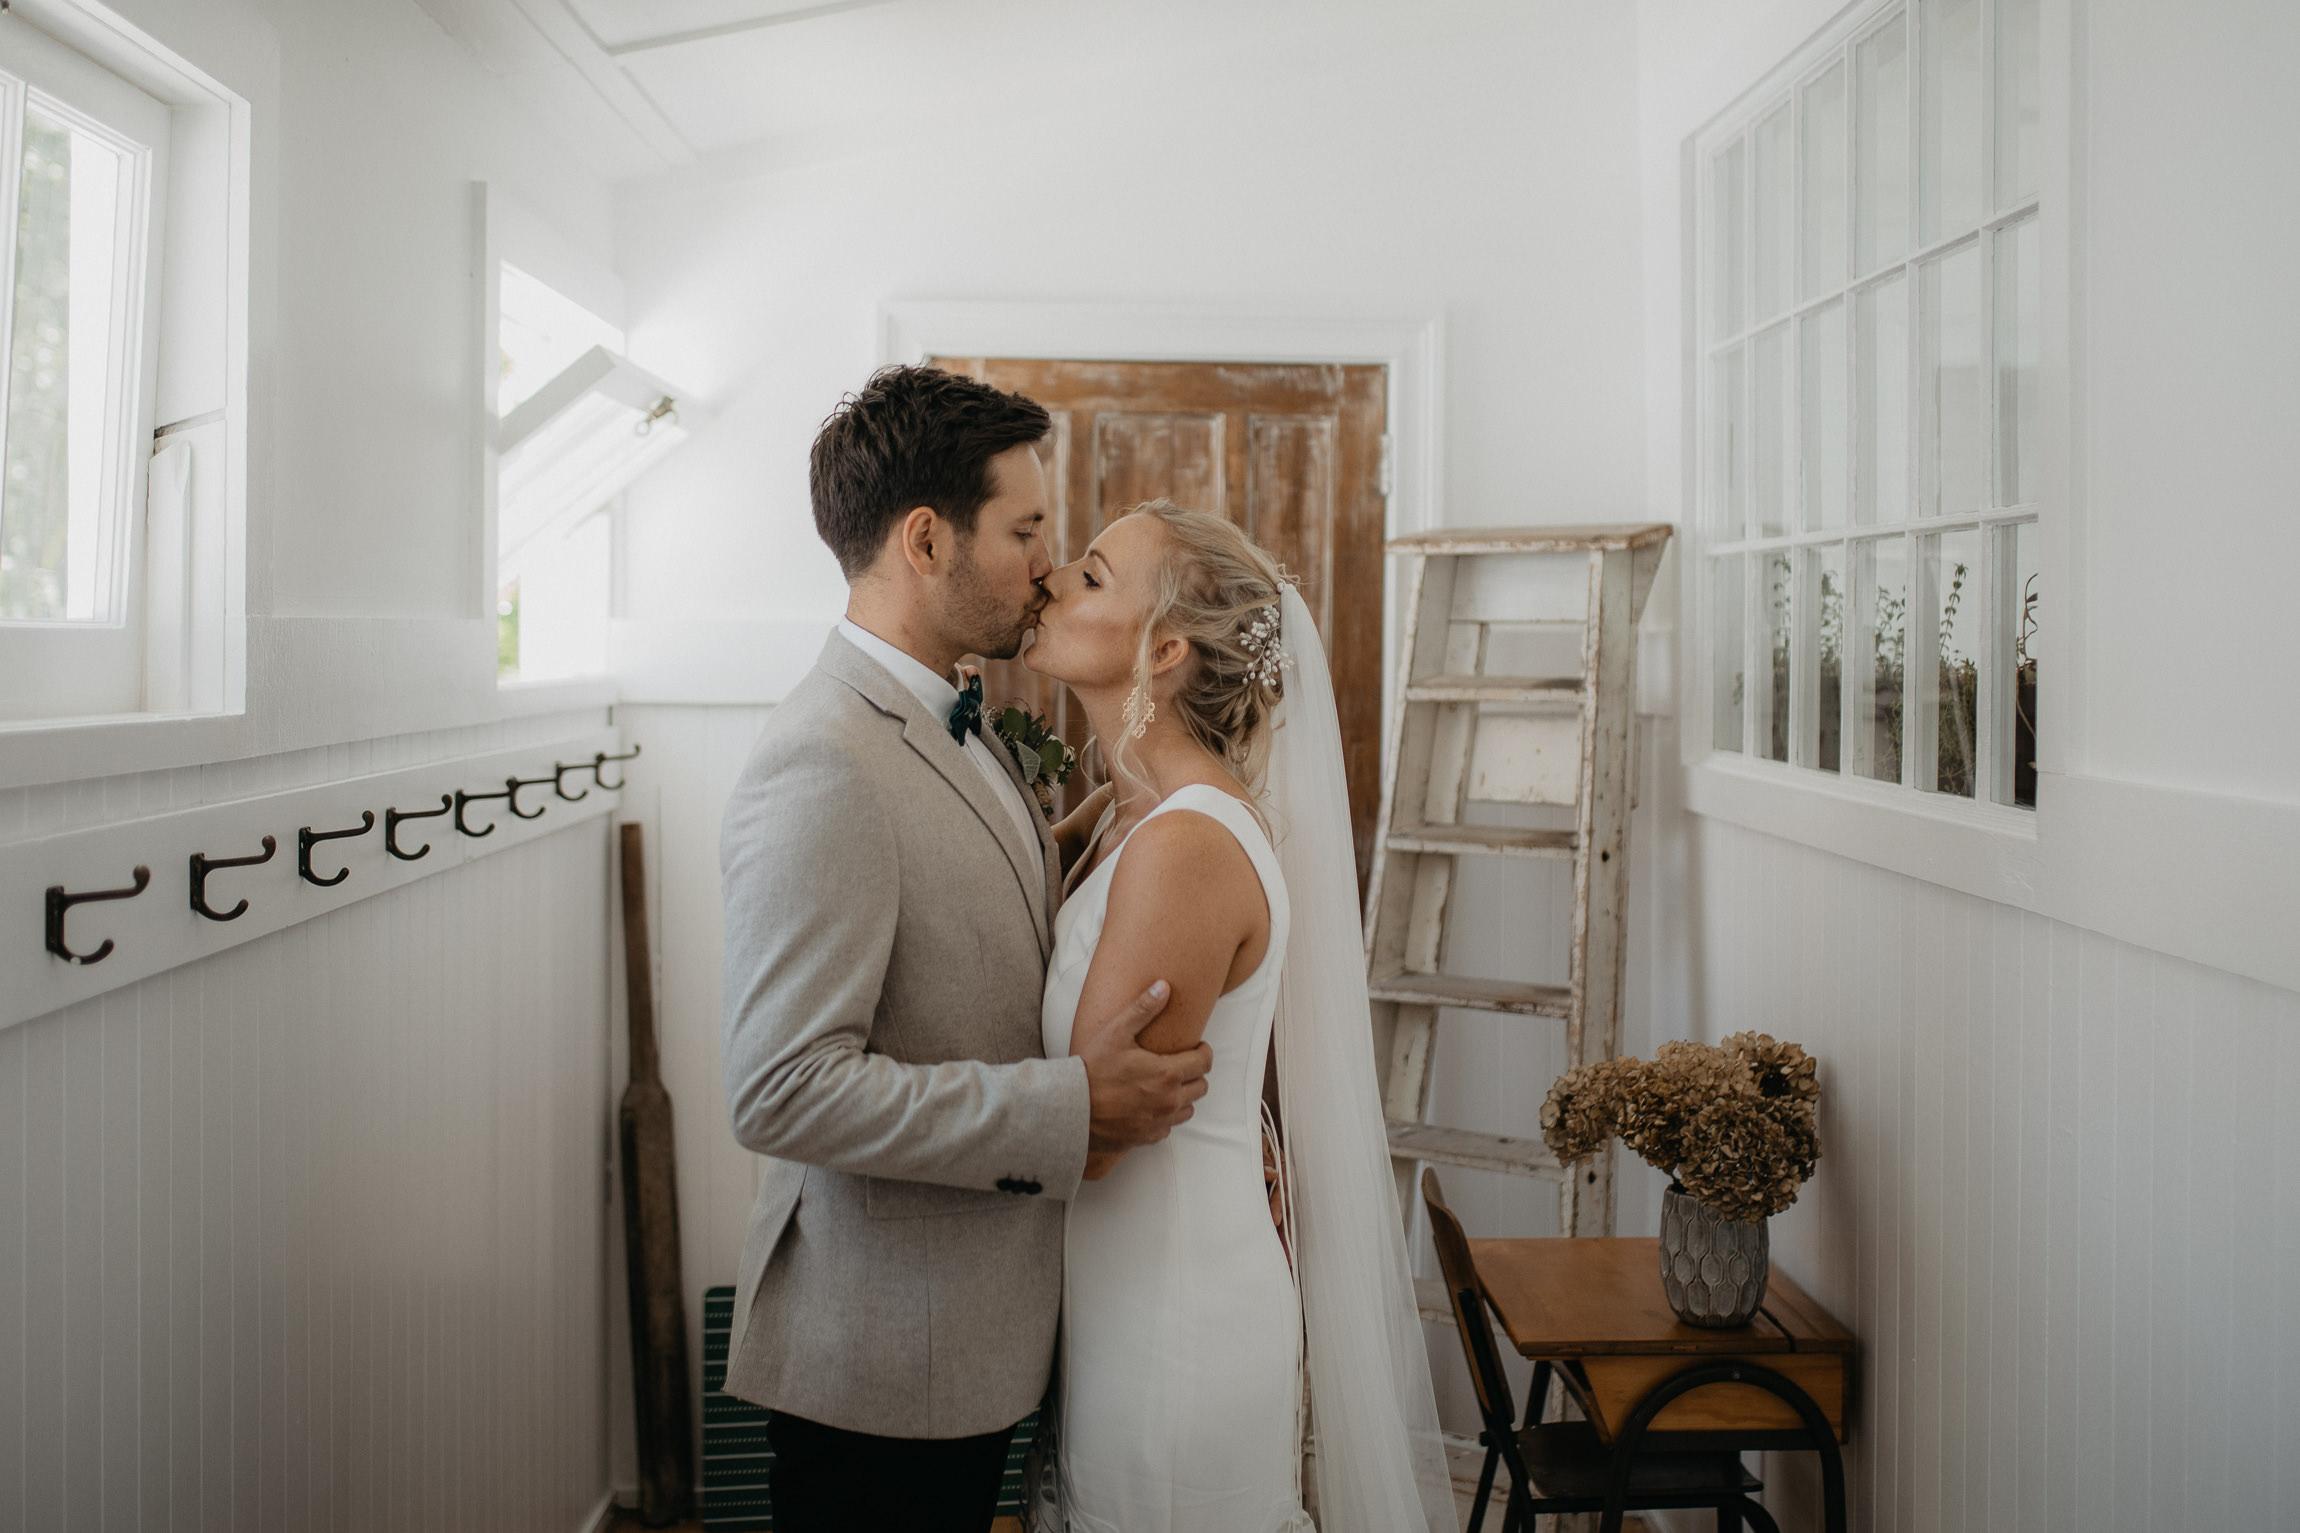 oldforestschool-wedding-blog-67.jpg